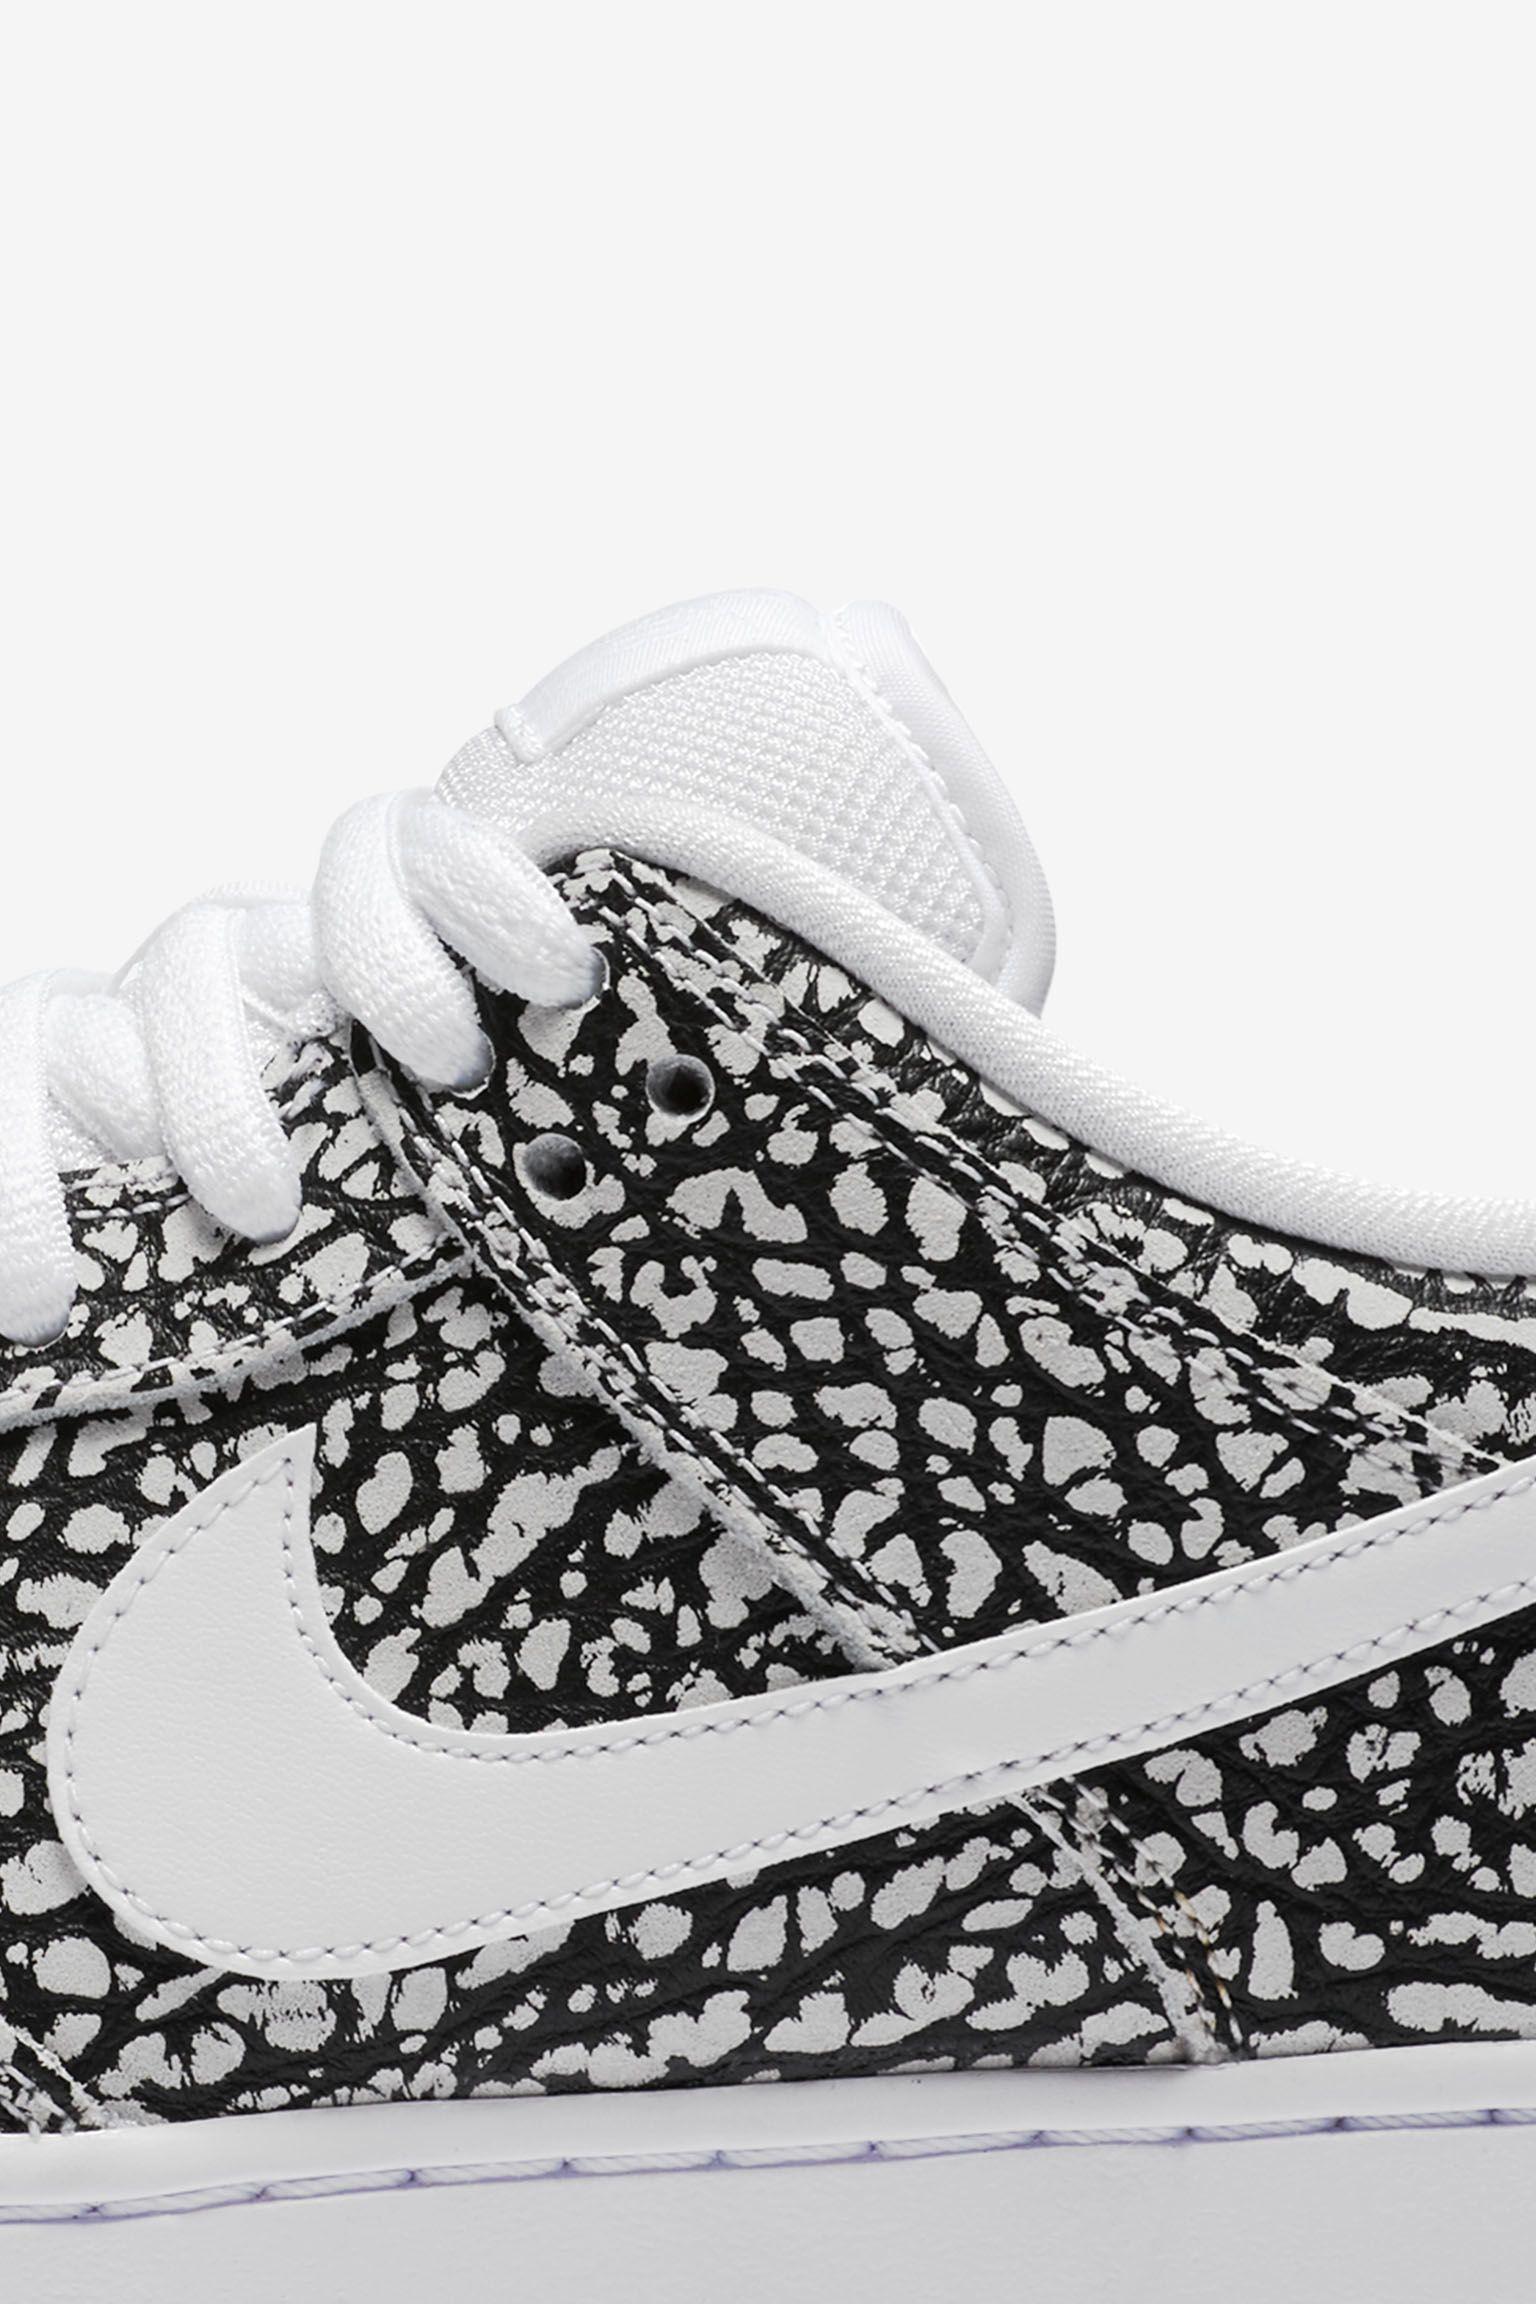 Nike SB Dunk Low 'Road'